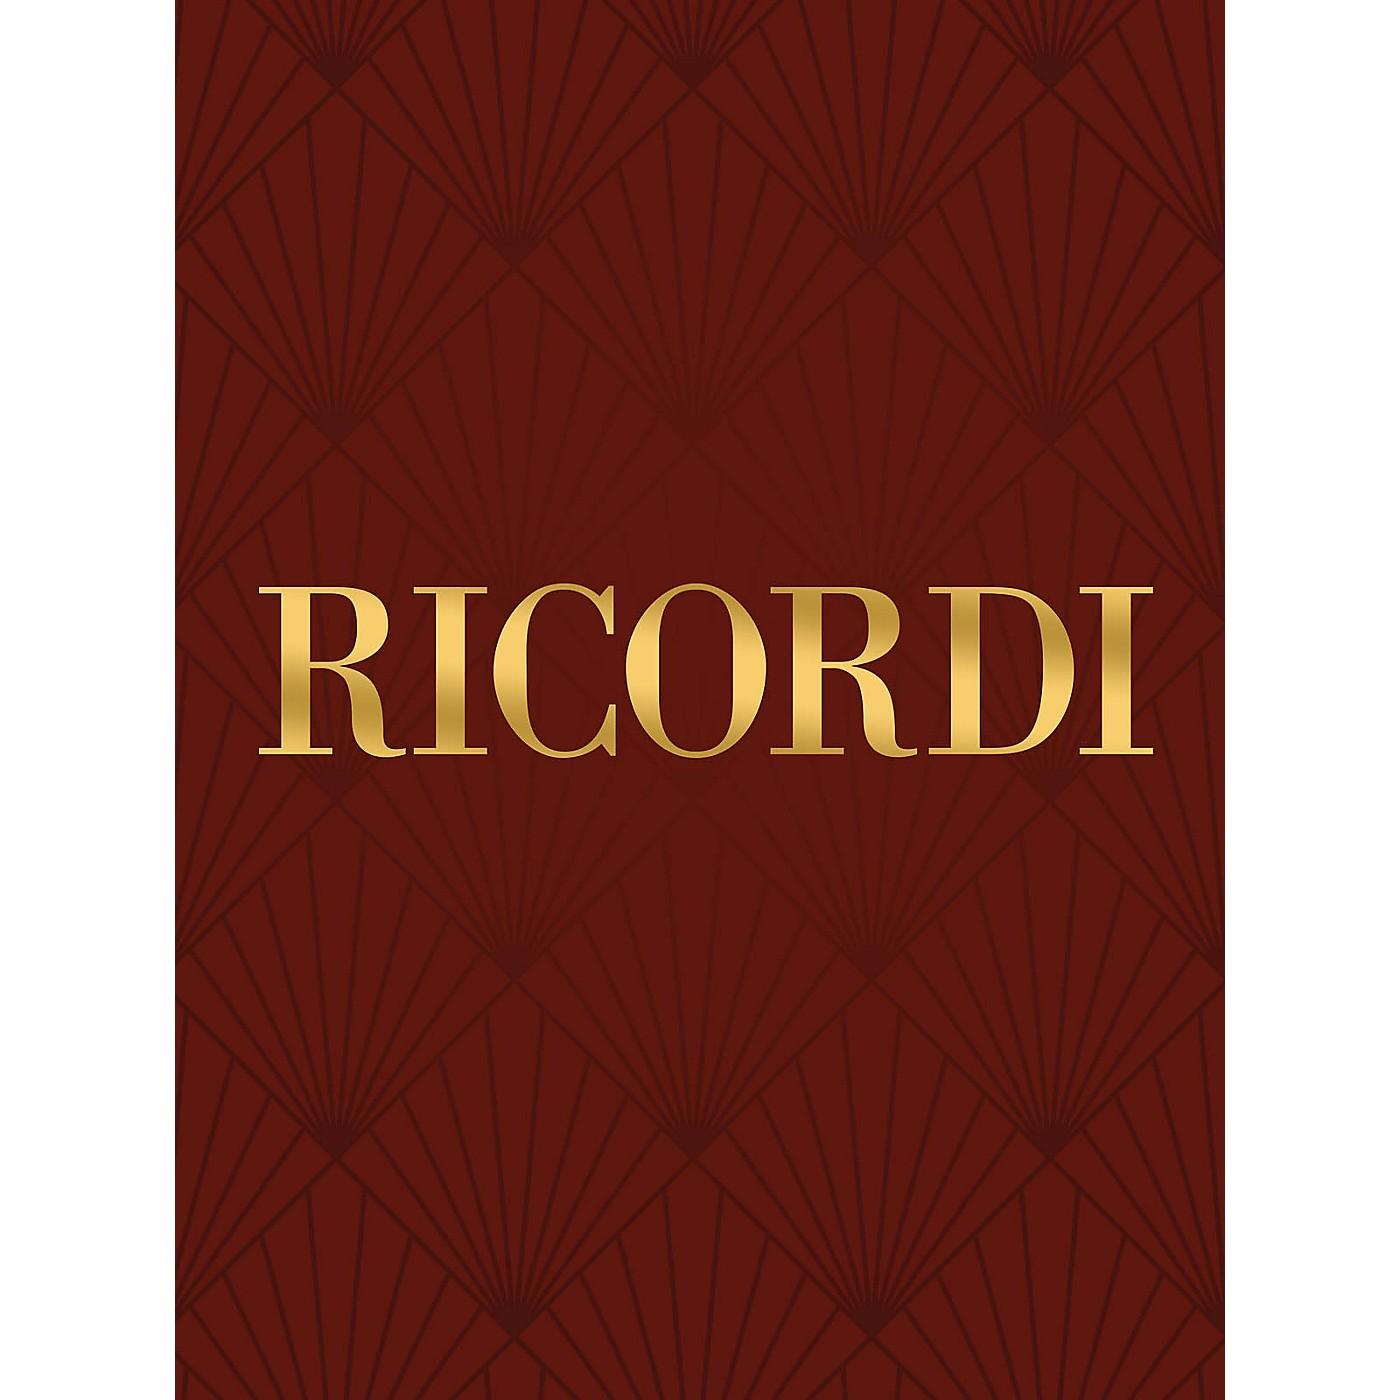 Ricordi 100 Studi, Op. 32 - Volume 1 (Violin Method) String Method Series Composed by Hans Sitt thumbnail